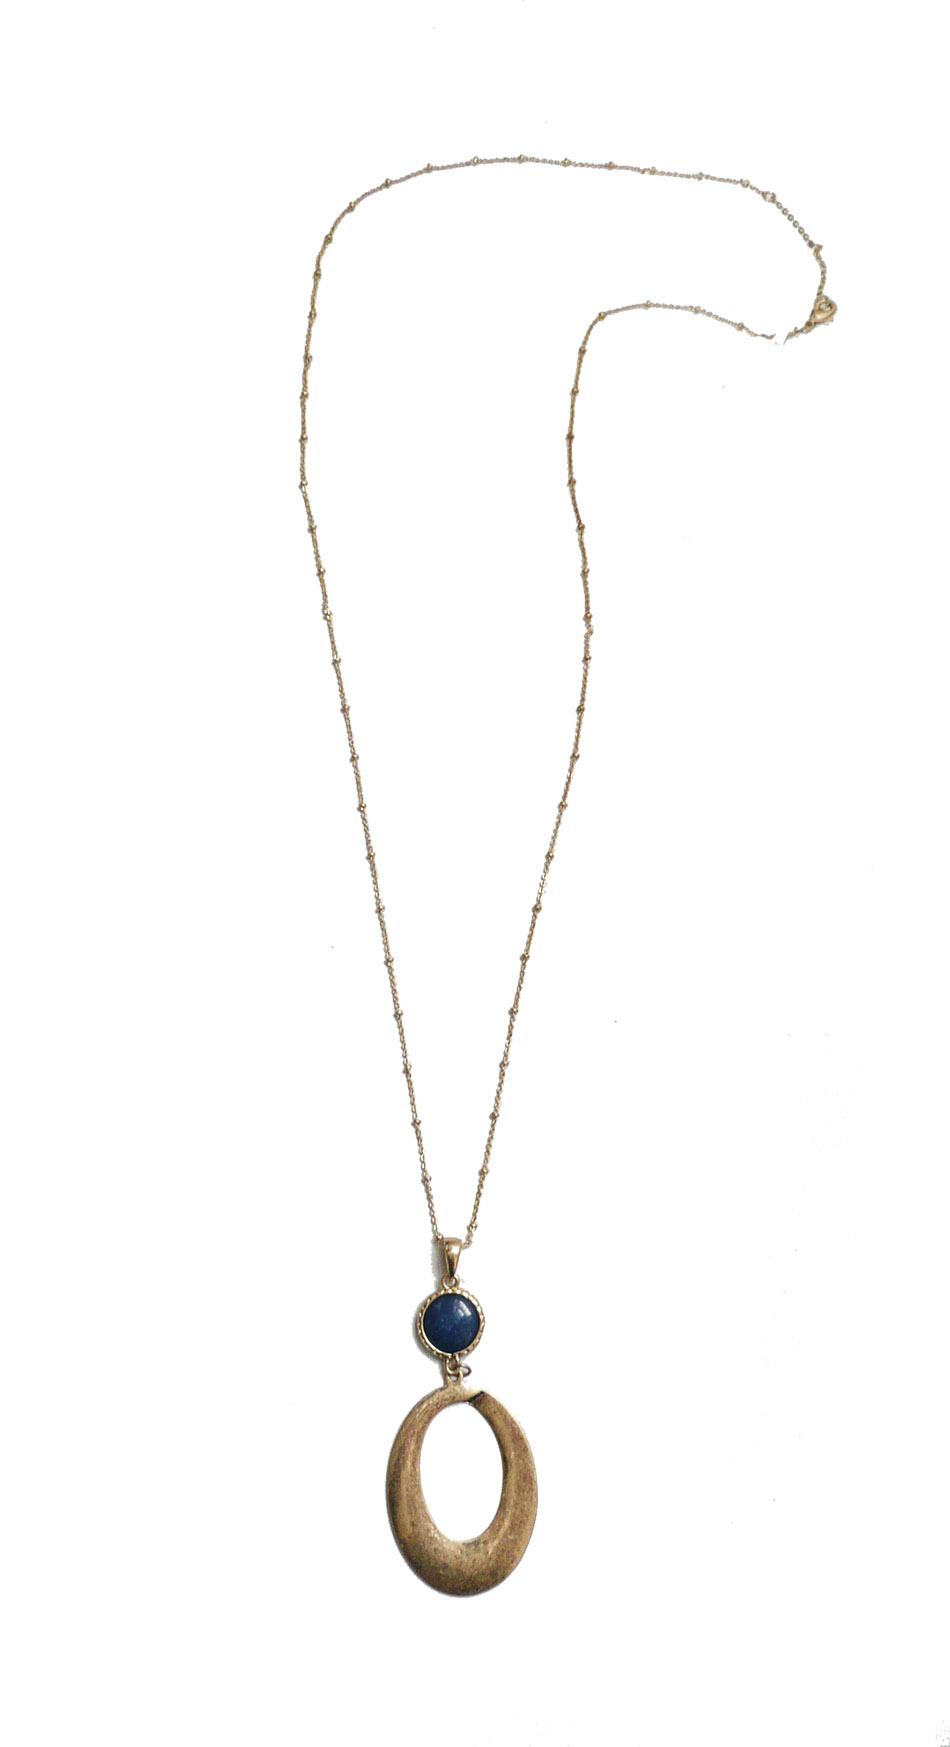 neck long oval blue stone.jpg